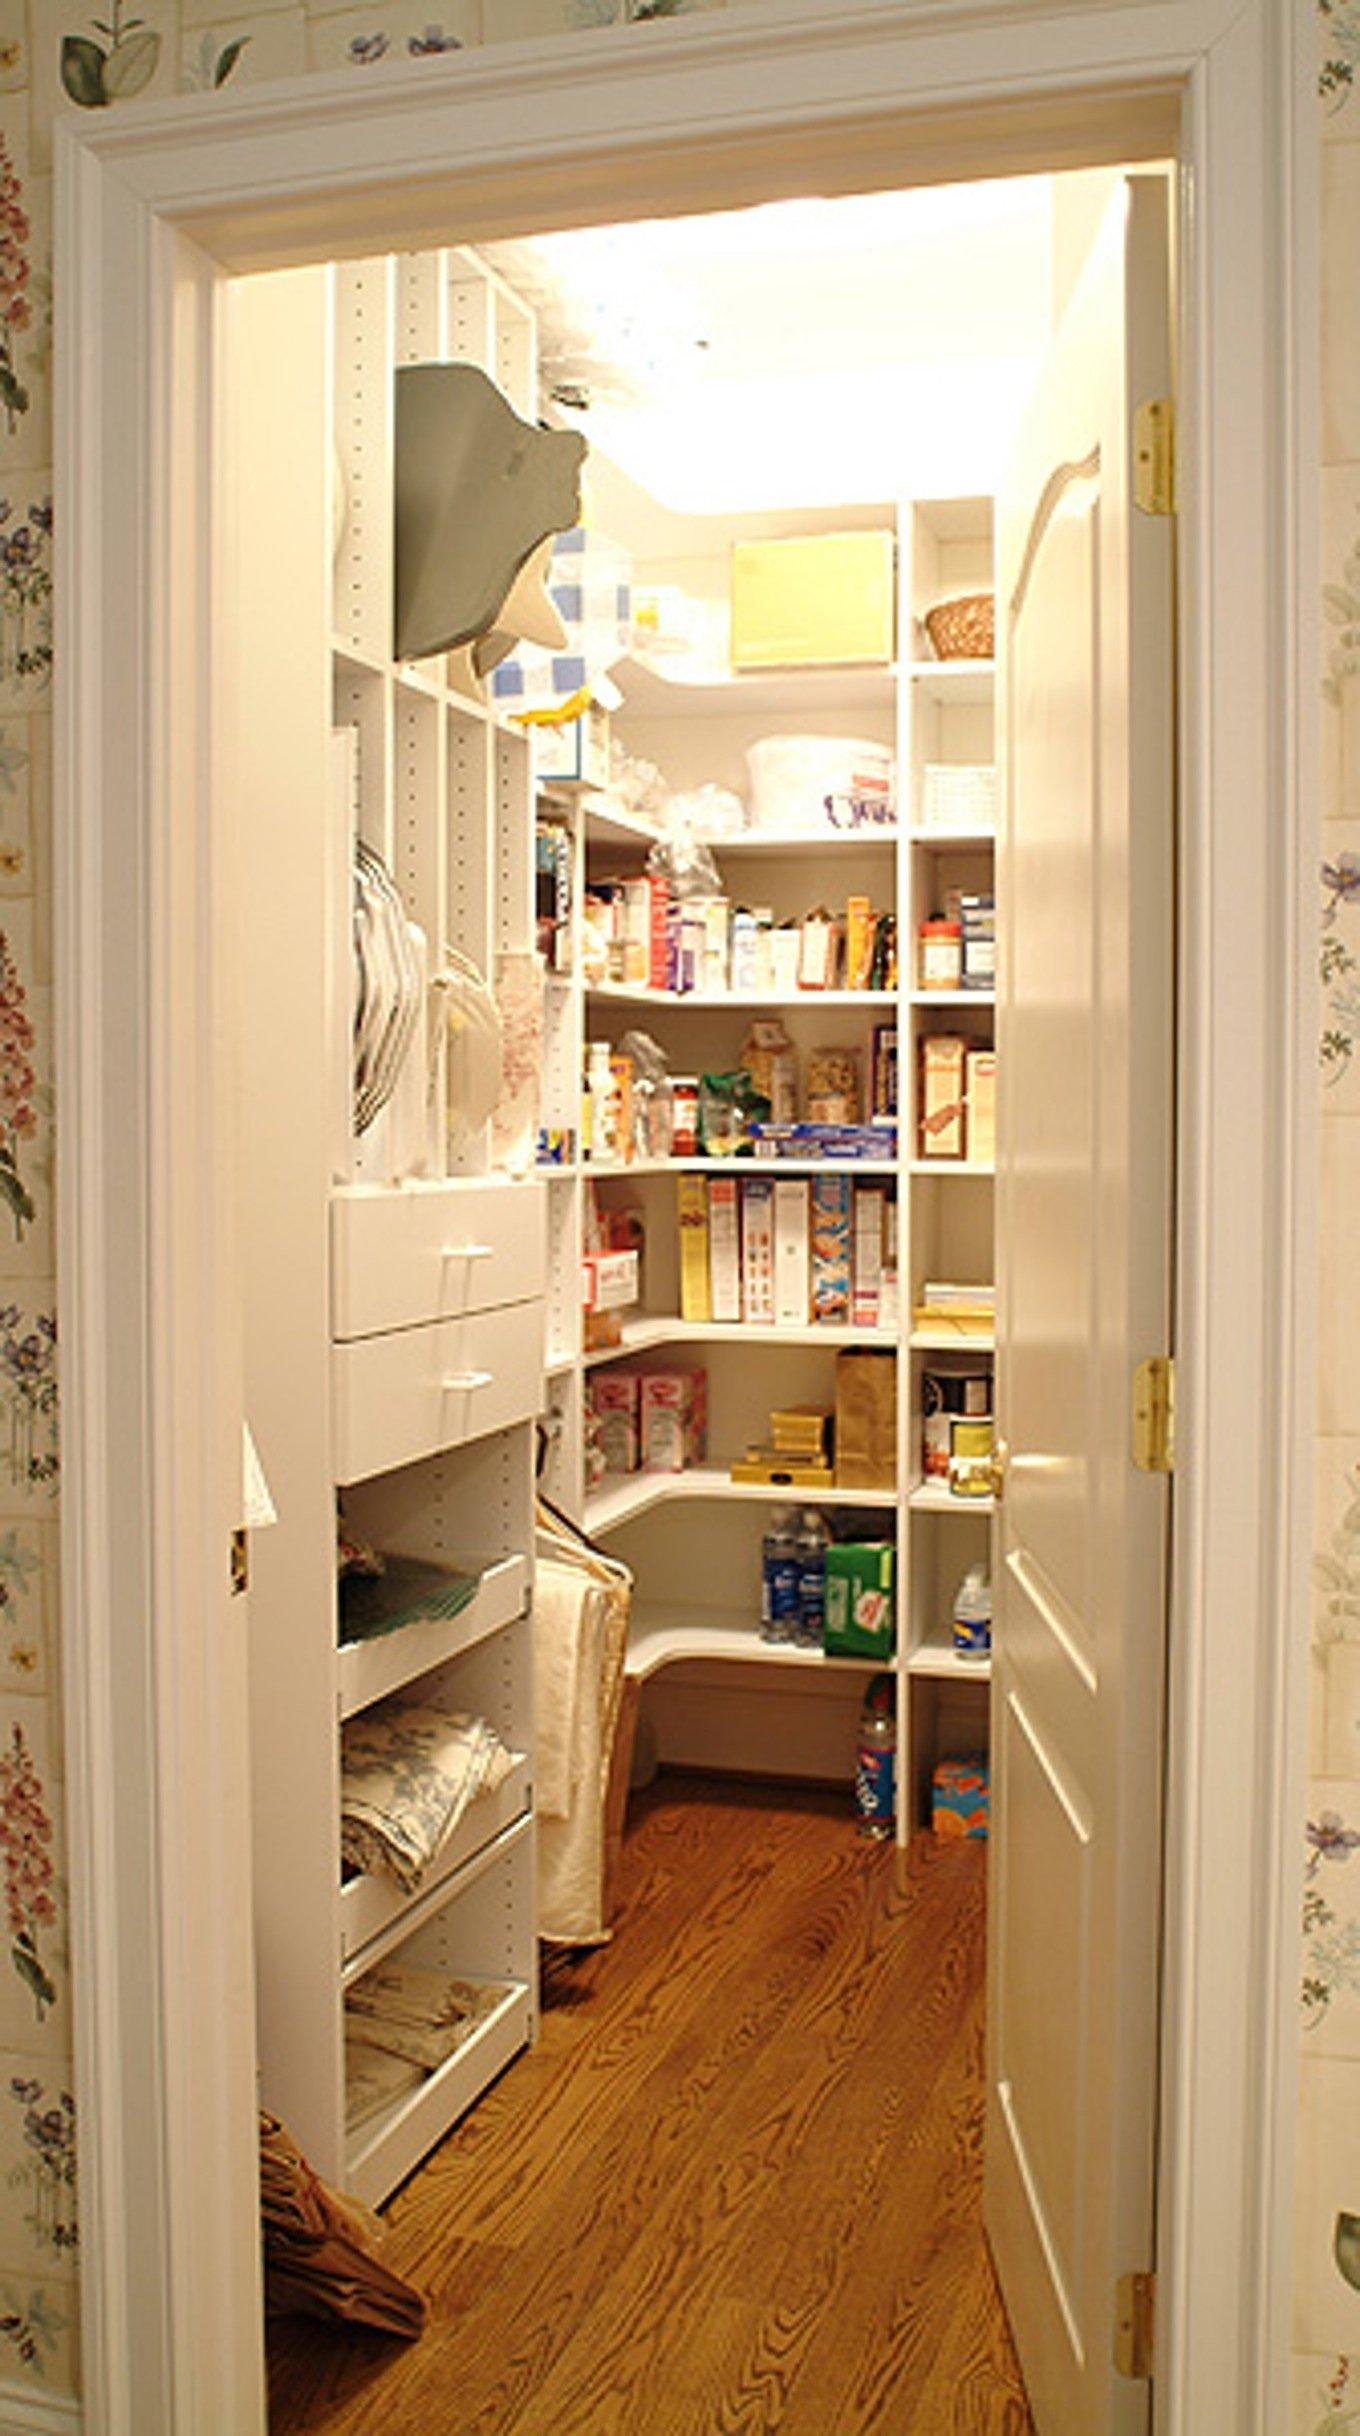 10 Wonderful Pantry Ideas For Small Kitchen kitchen pantry ideas small kitchens design for sale nsw pinterest 2020